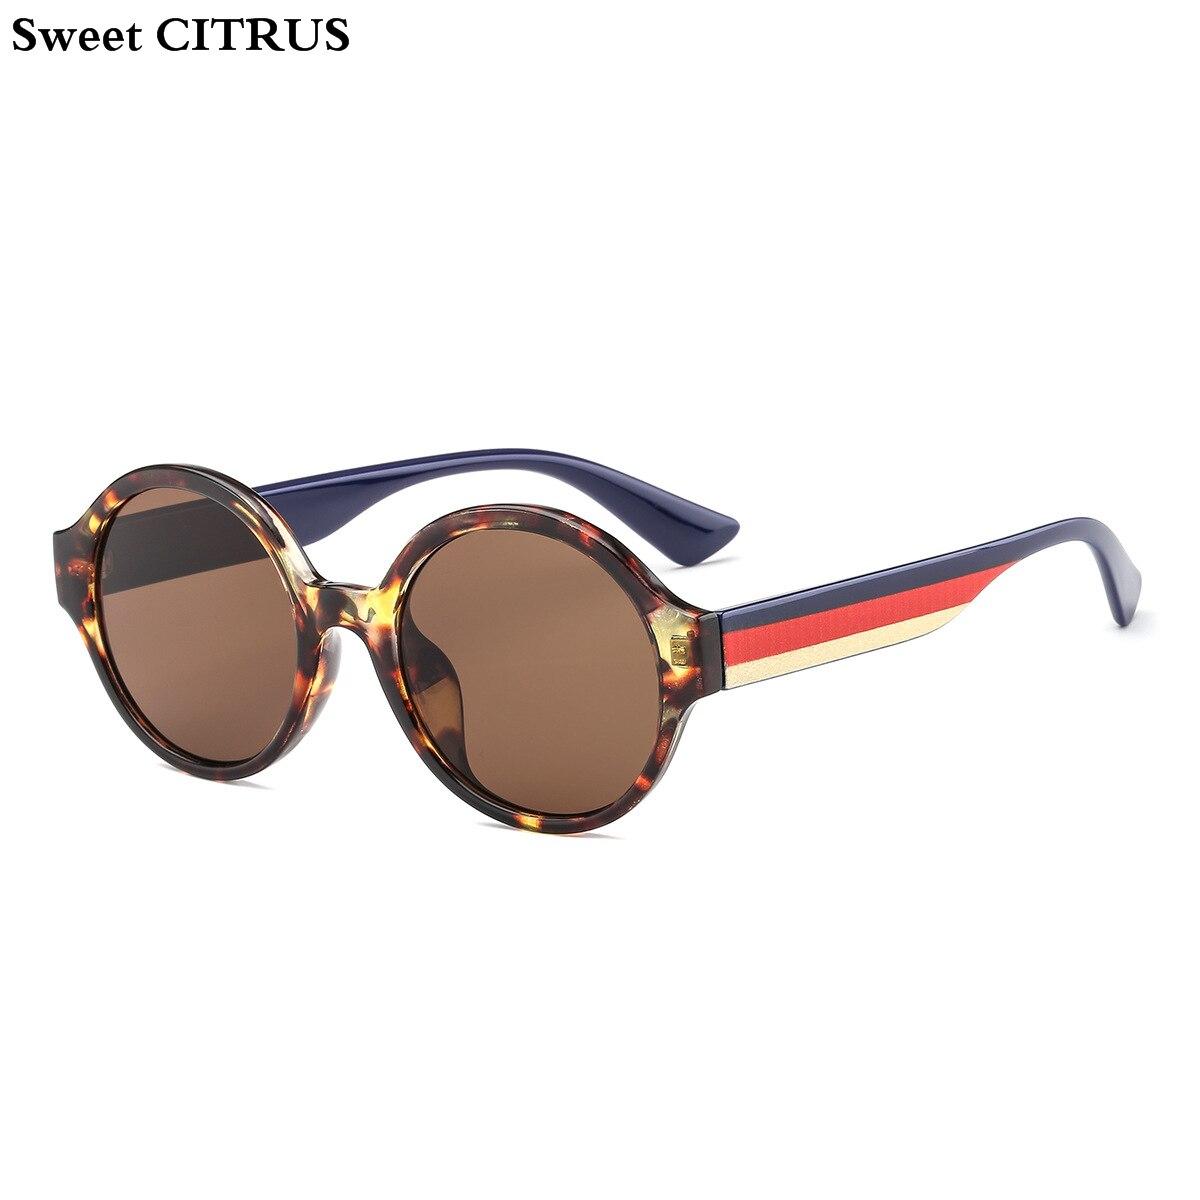 Sweet CITRUS 2018 Round Sunglasses Women Men Luxury Italy Br